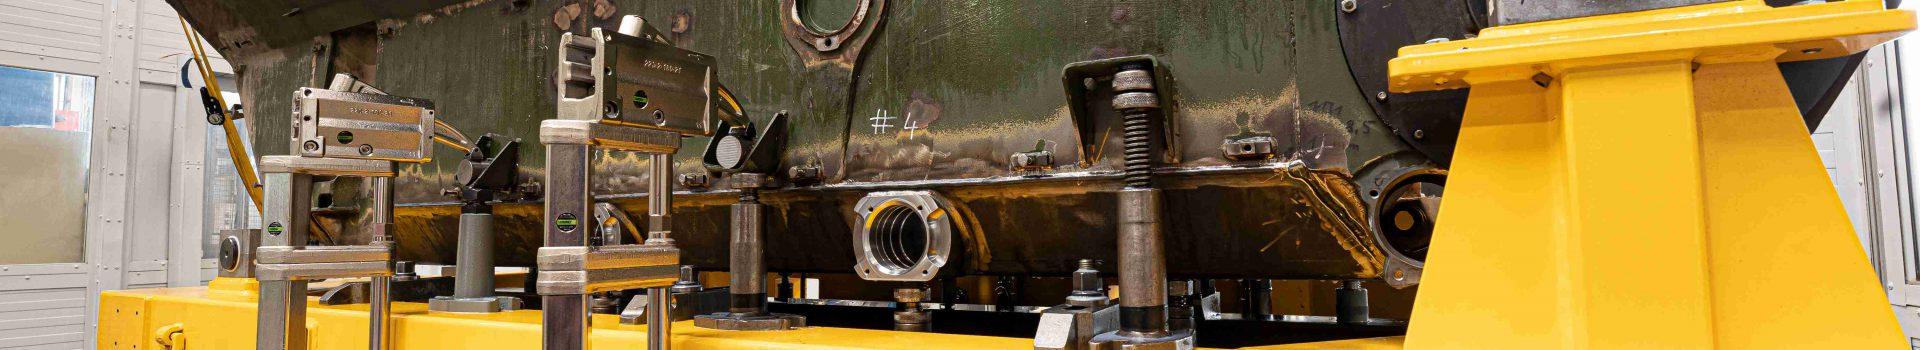 "CNC-Bohrwerksbearbeitung des Kettenfahrzeugs ""Wiesel 1"""